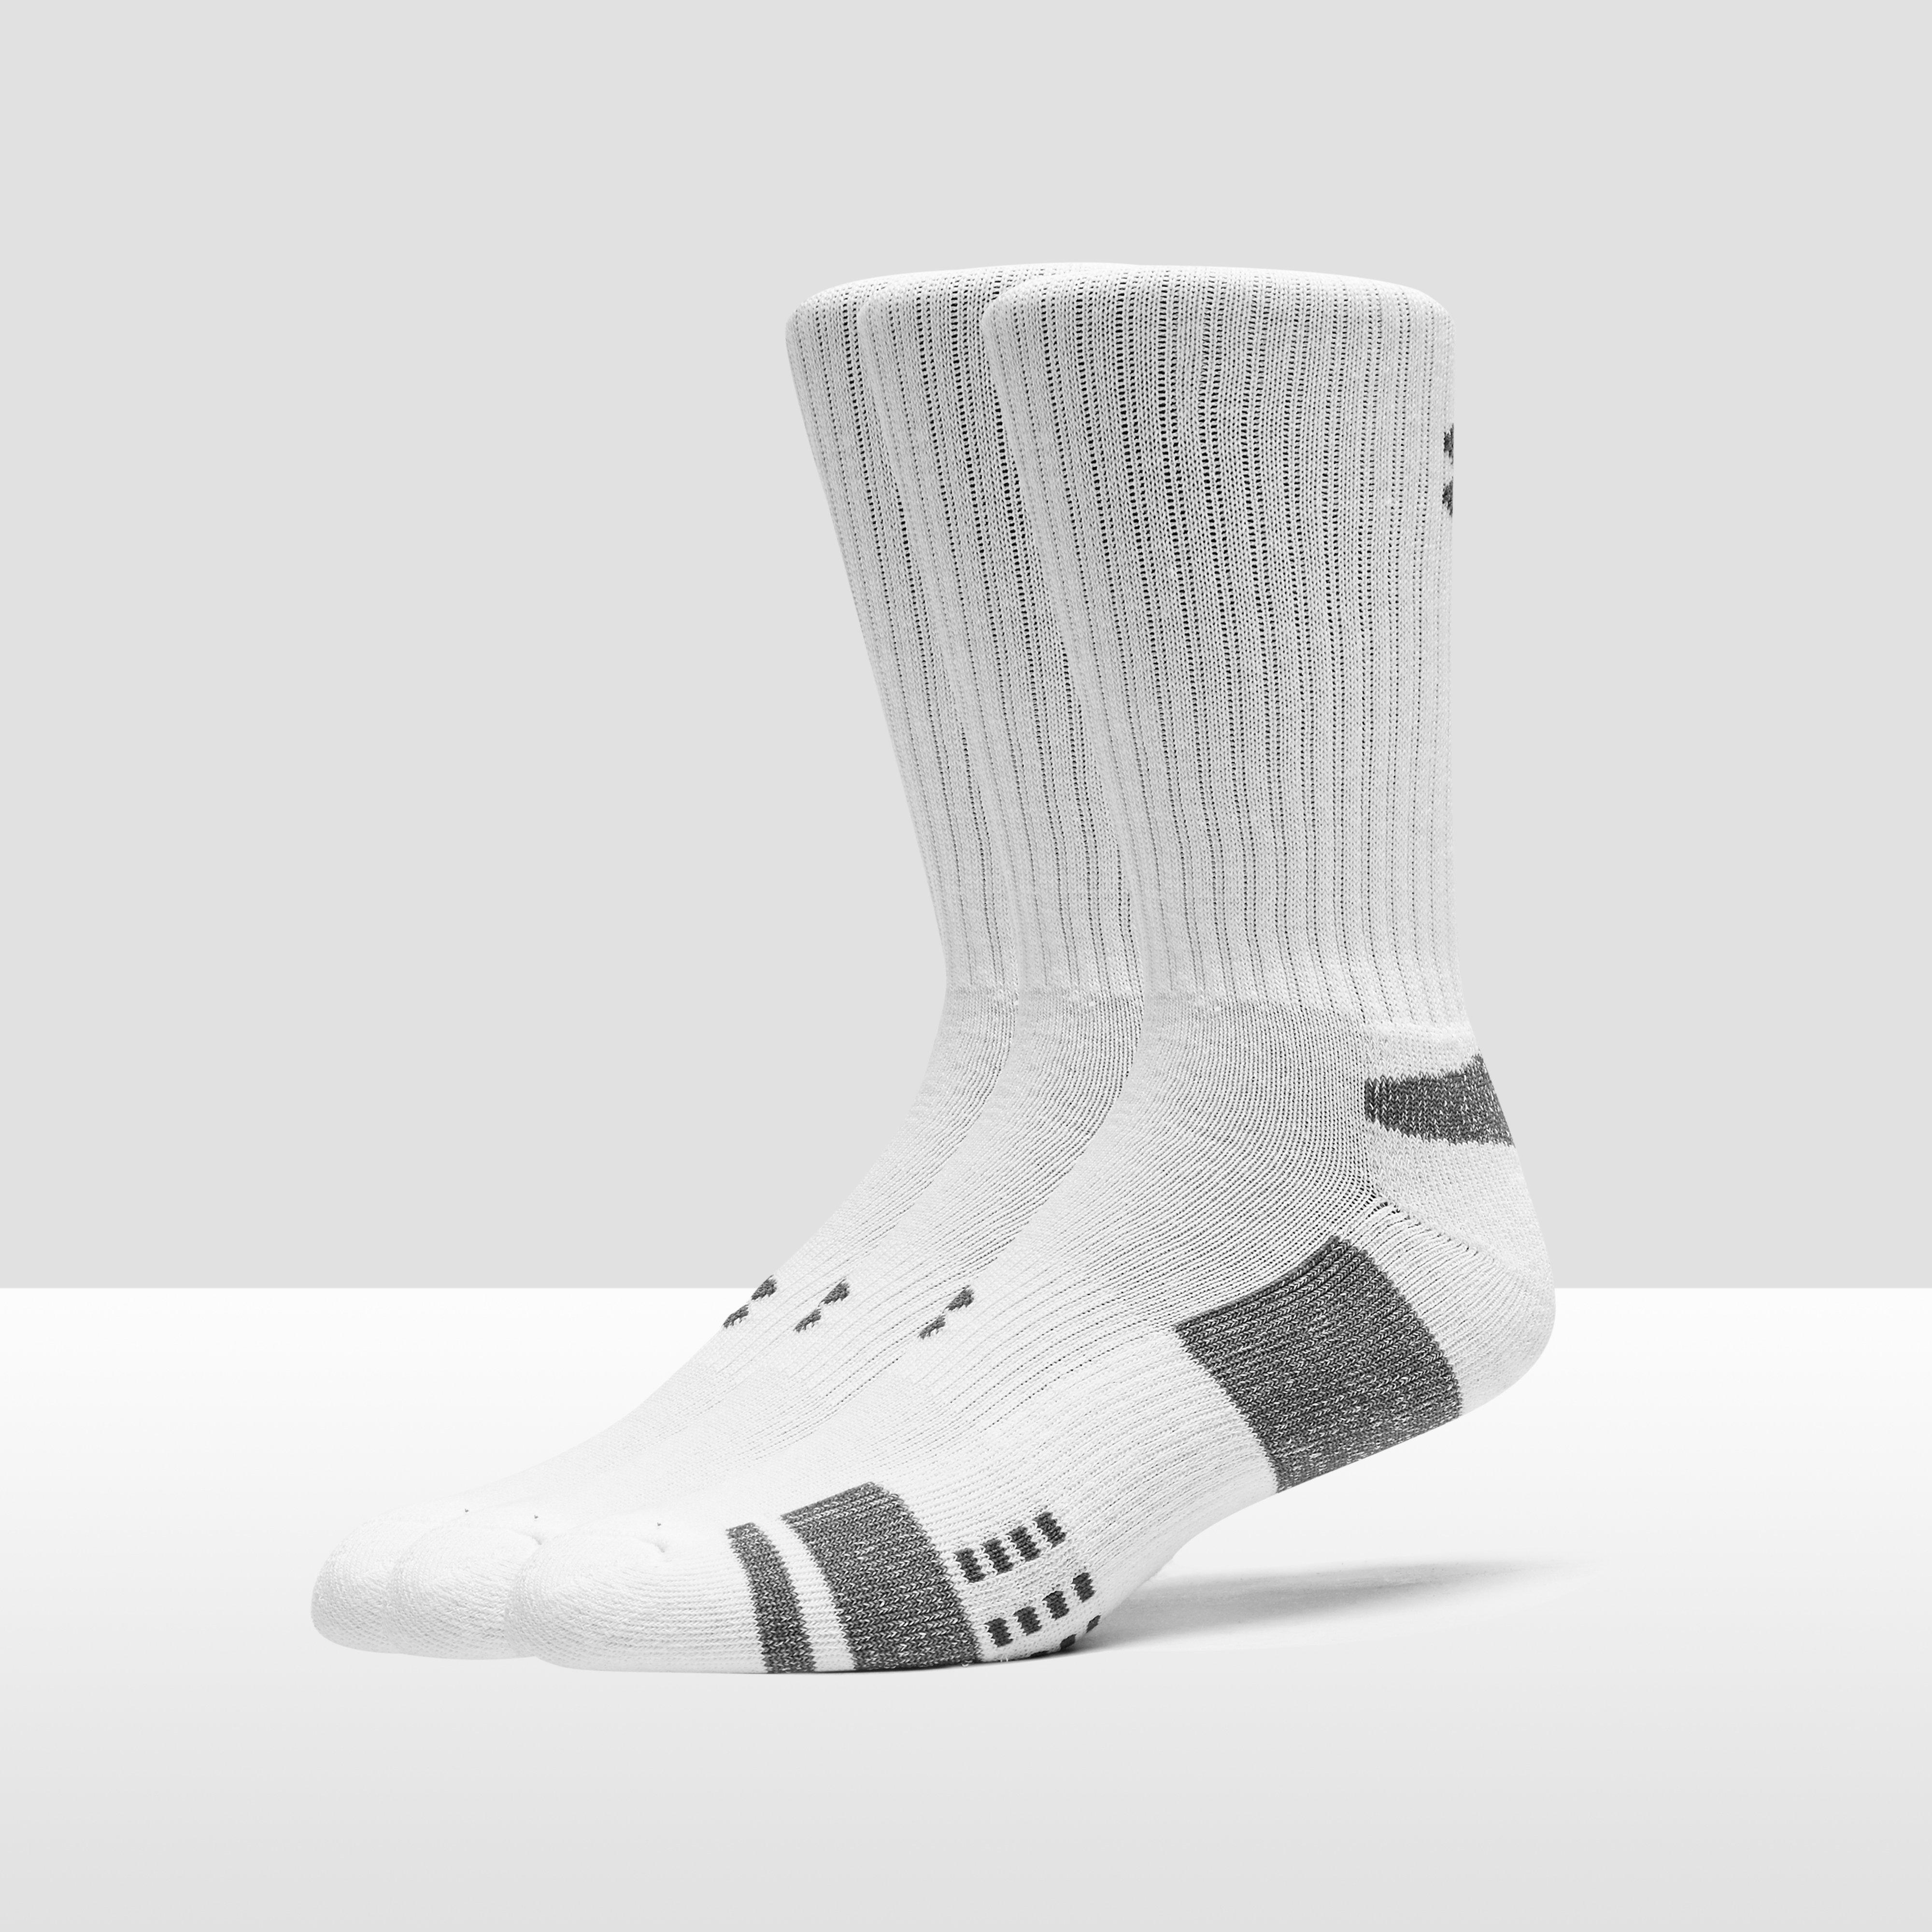 Sokken - Wit. Chaussettes - Blanc. - Heren - Xl - Les Hommes - Xl 54ndU5Ew